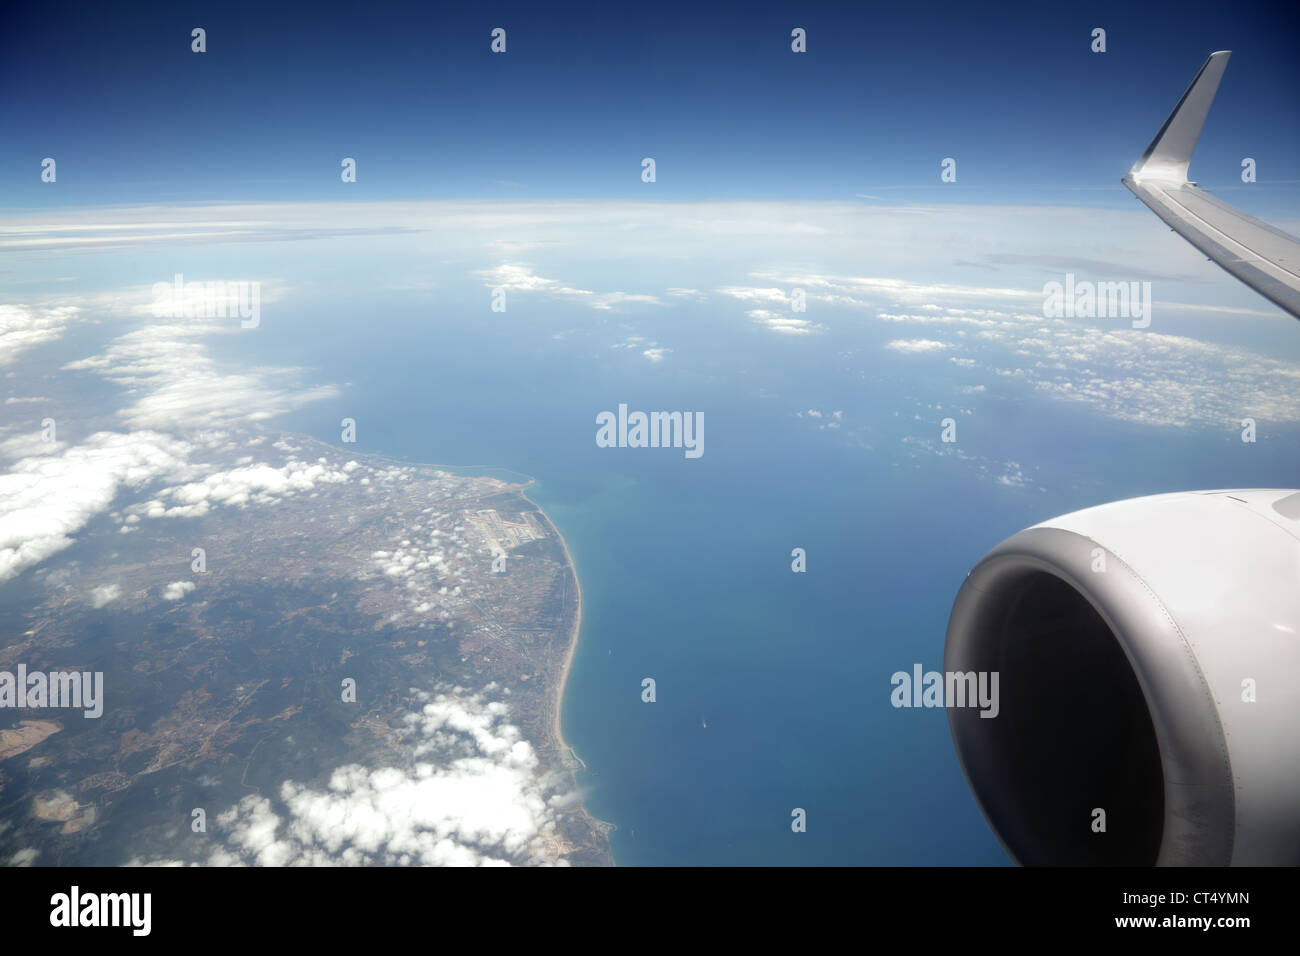 Airplane window - Stock Image